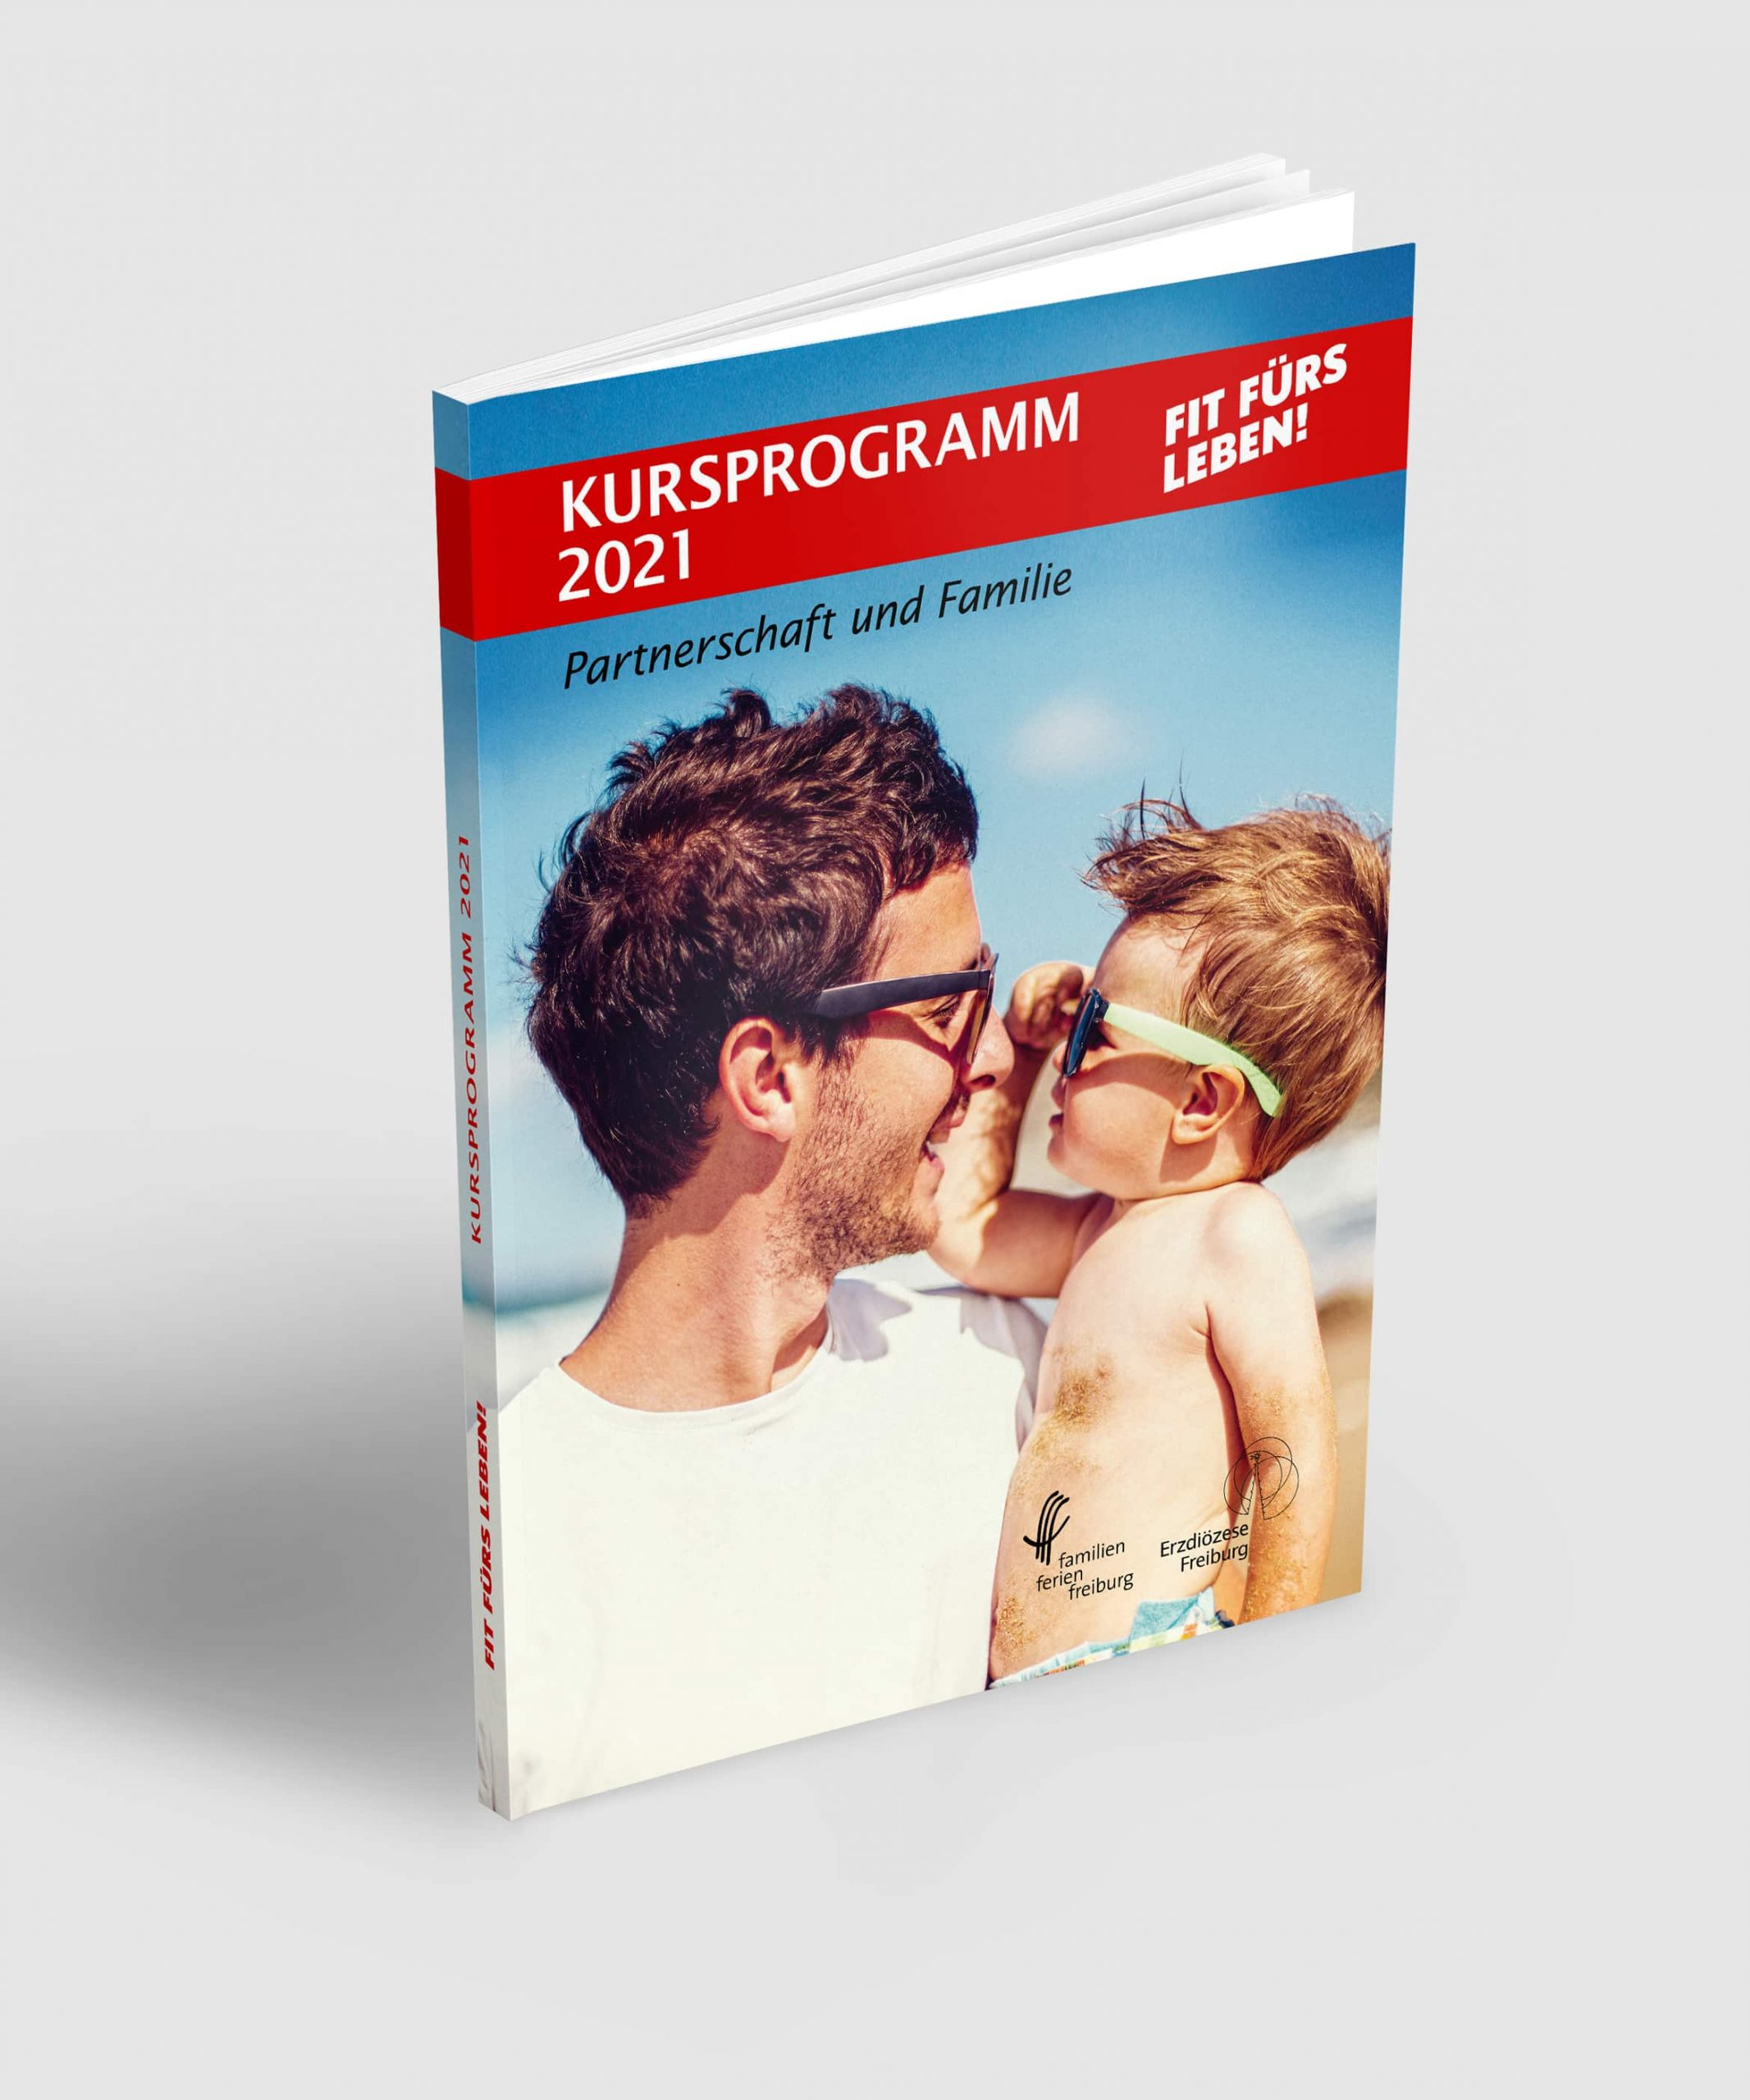 ESA_2021_Kursprogramm_IN01